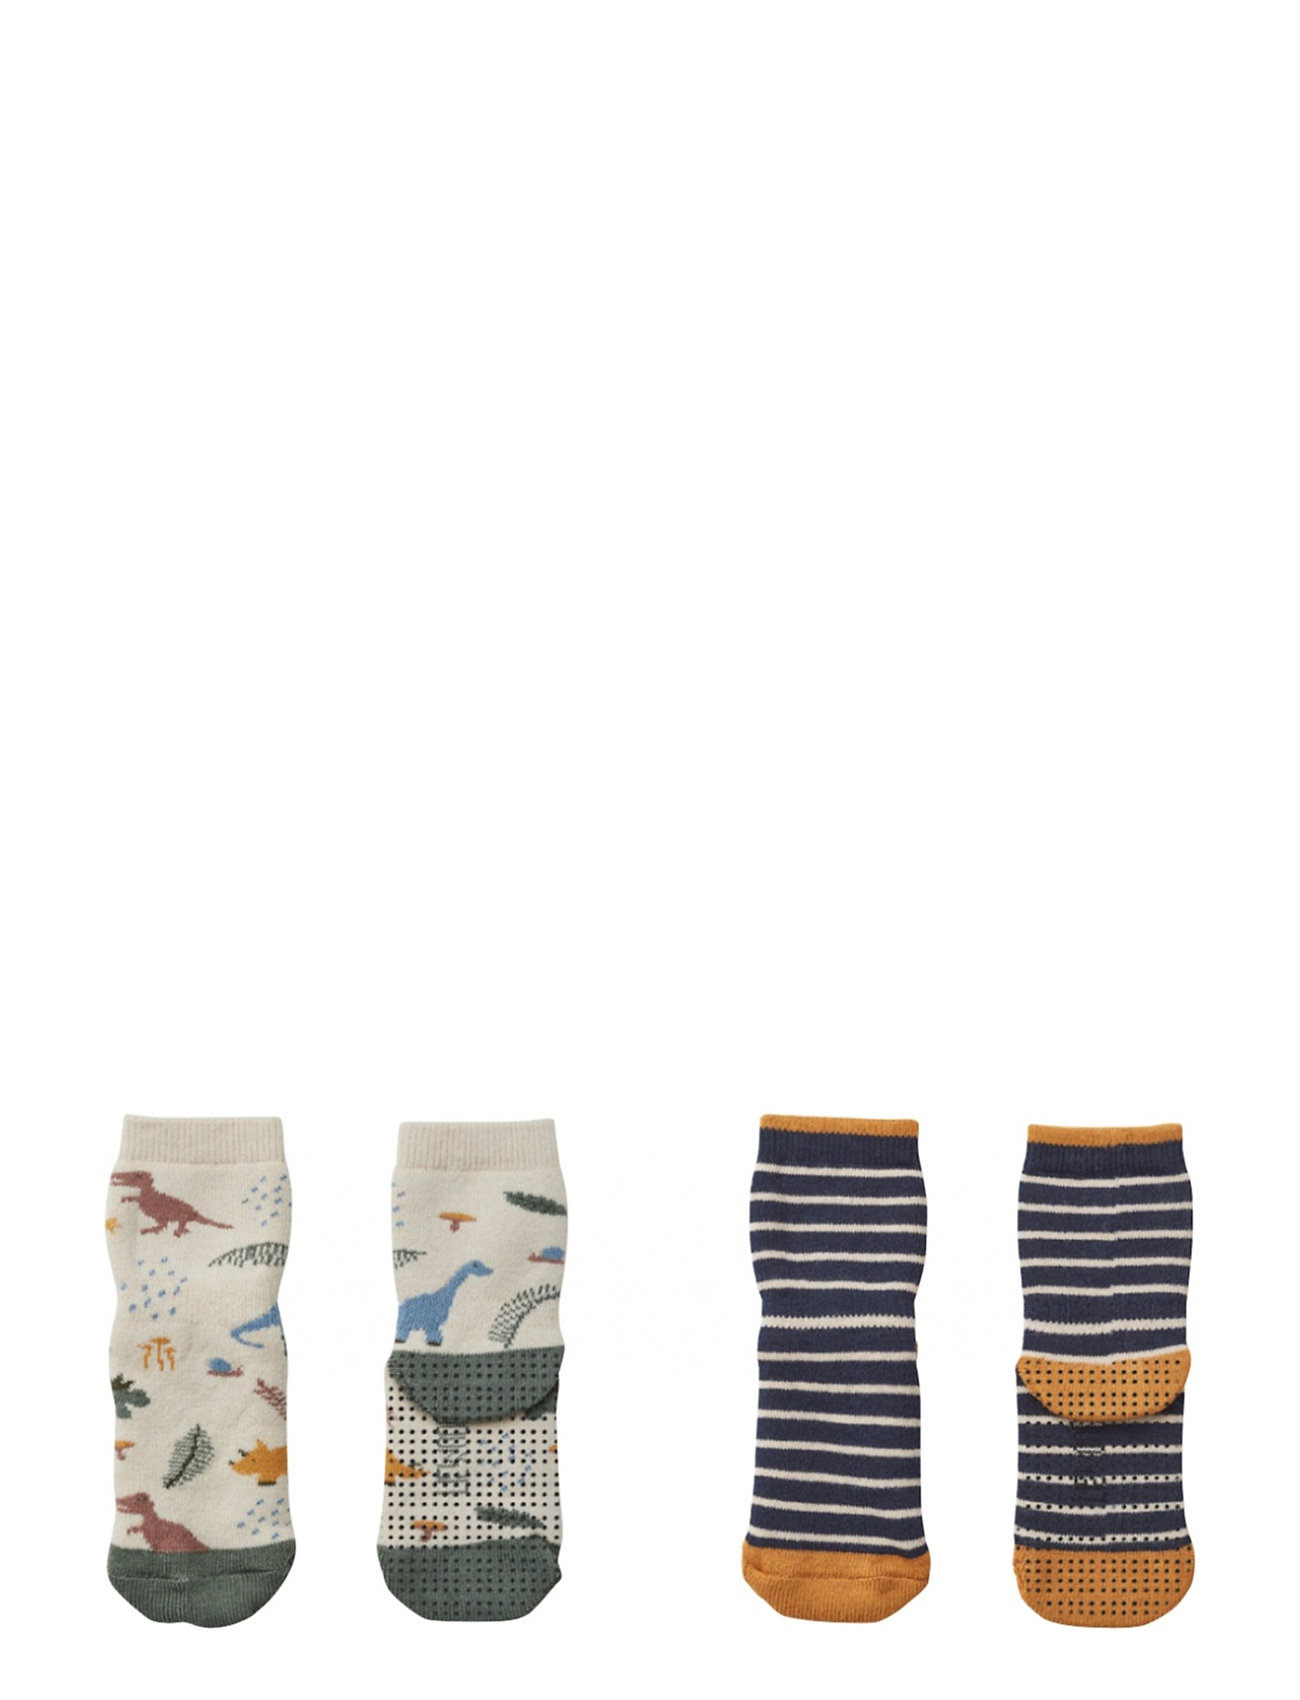 Liewood Nellie anti slip socks 2-pack - DINO MIX